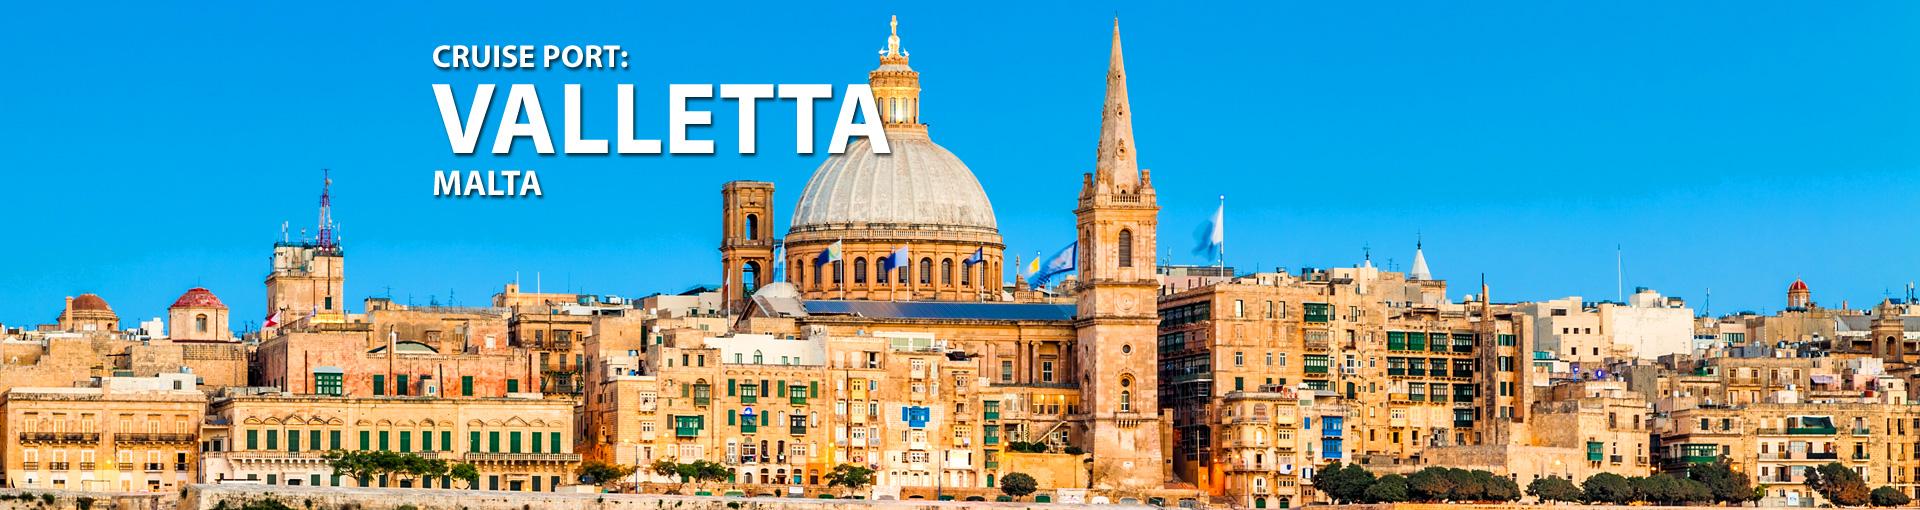 valletta-malta-cruise-port-banner